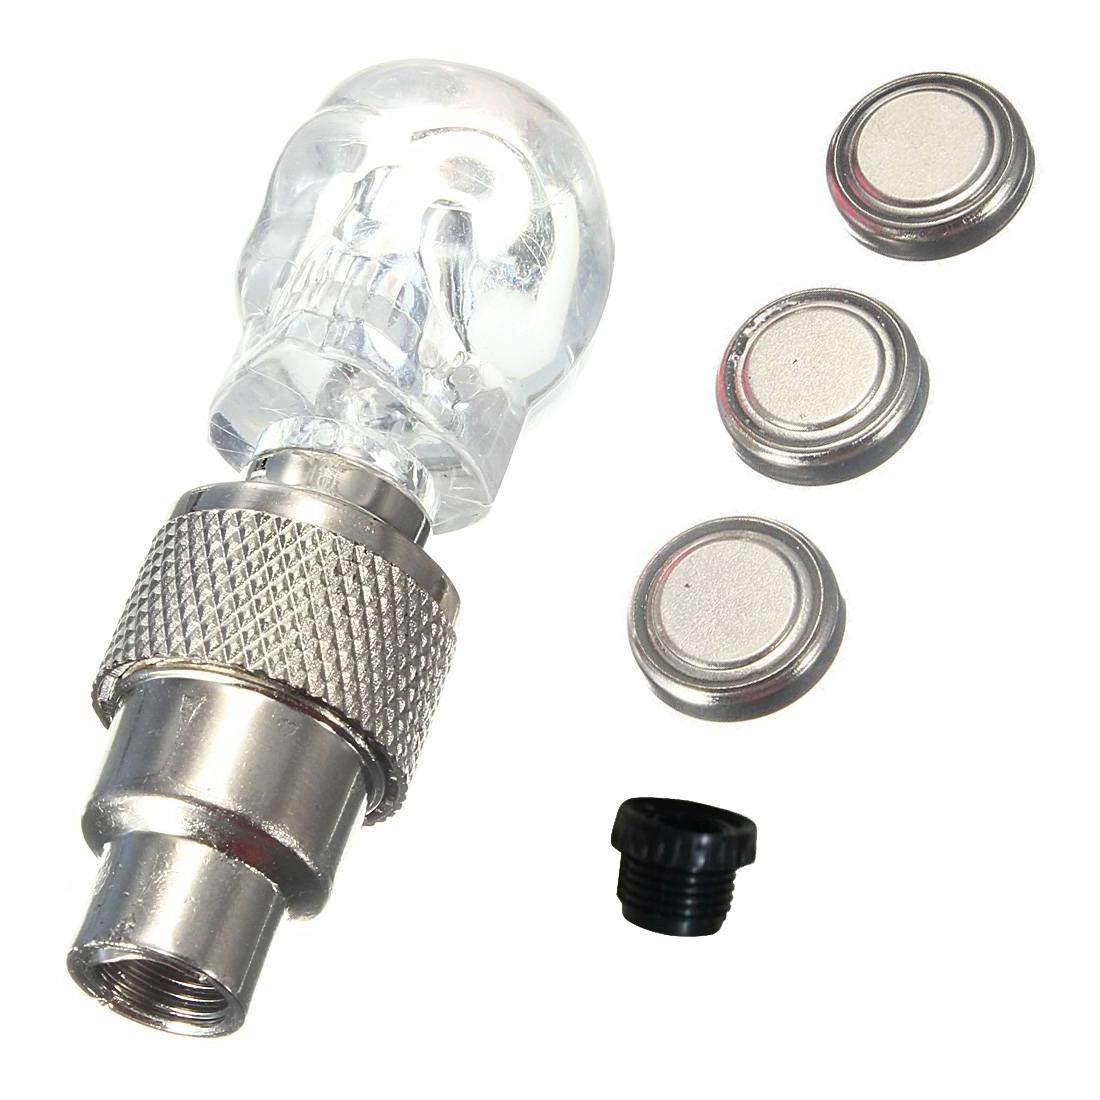 led licht ventilkappe speichenlicht fuer fahrrad auto bike. Black Bedroom Furniture Sets. Home Design Ideas